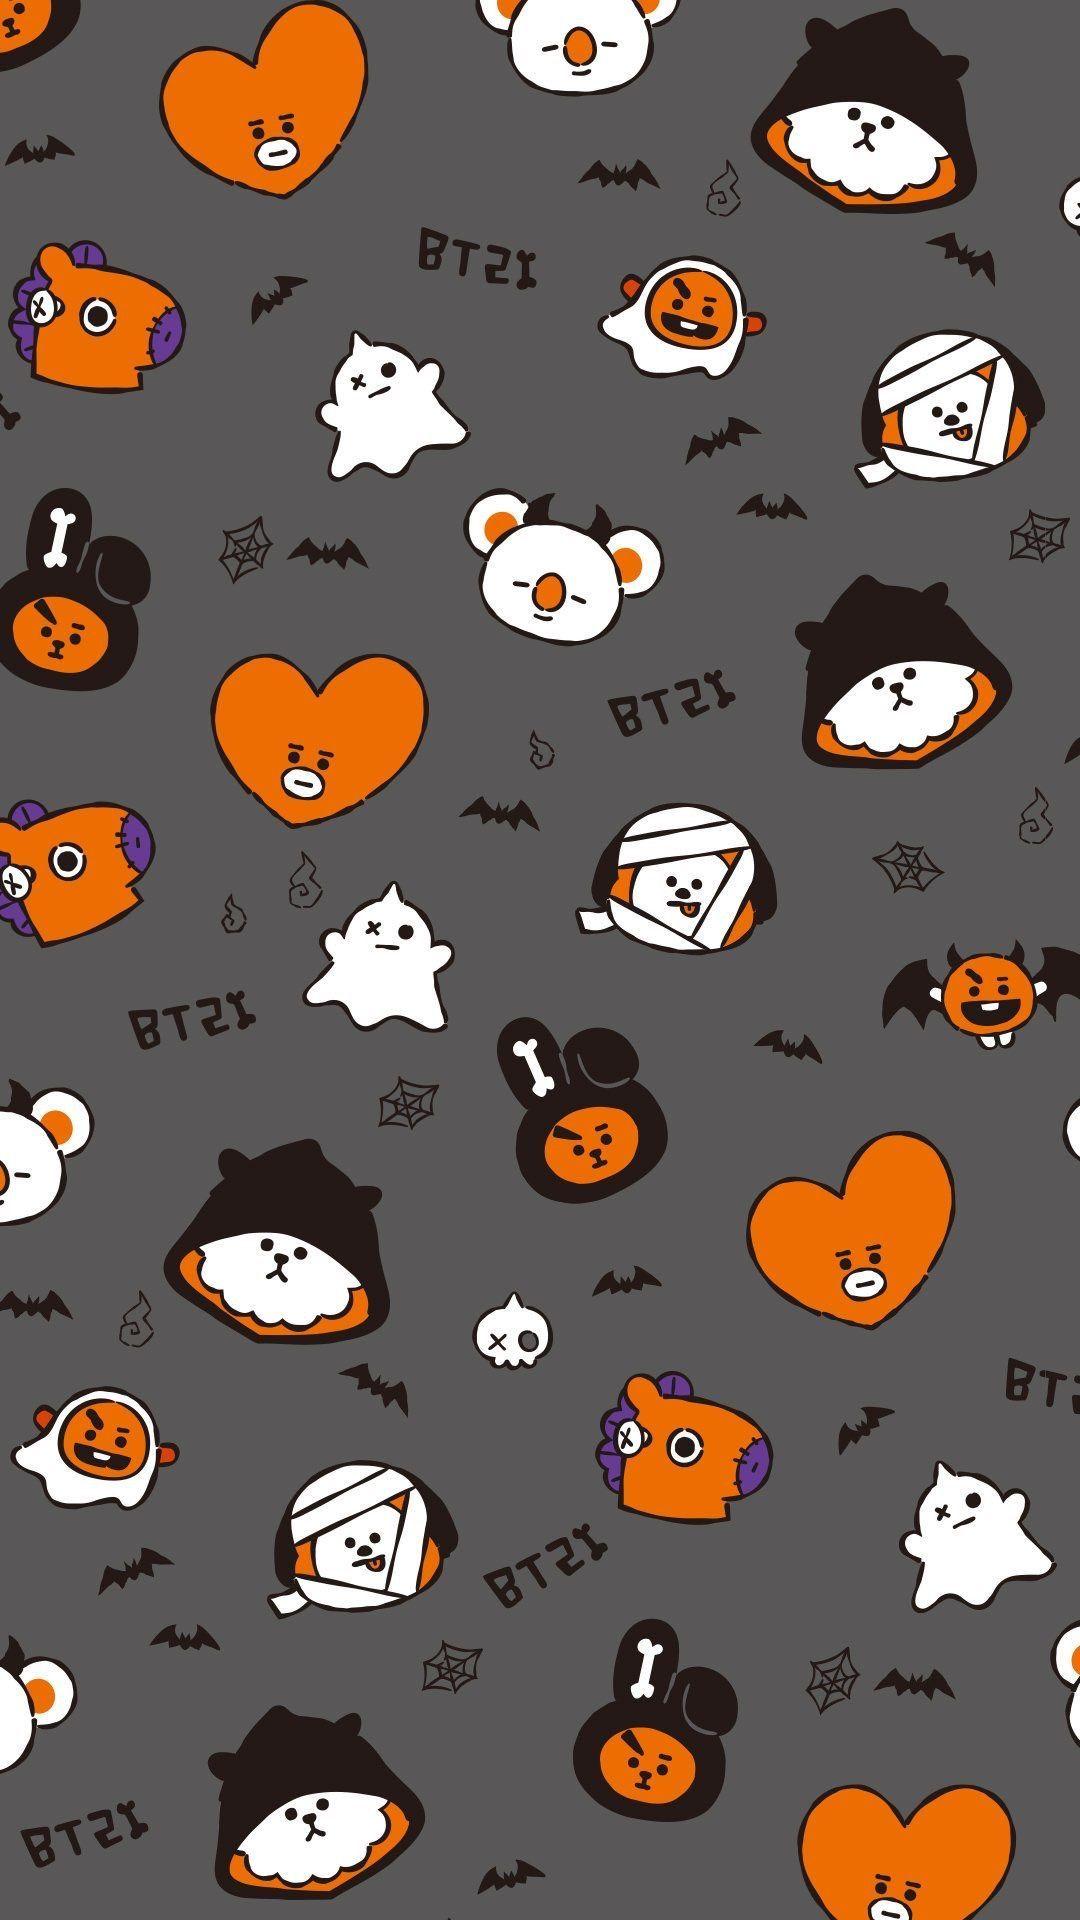 Wallpaper Bt21 Koya Hd In 2020 Halloween Wallpaper Bts Wallpaper Bts Halloween